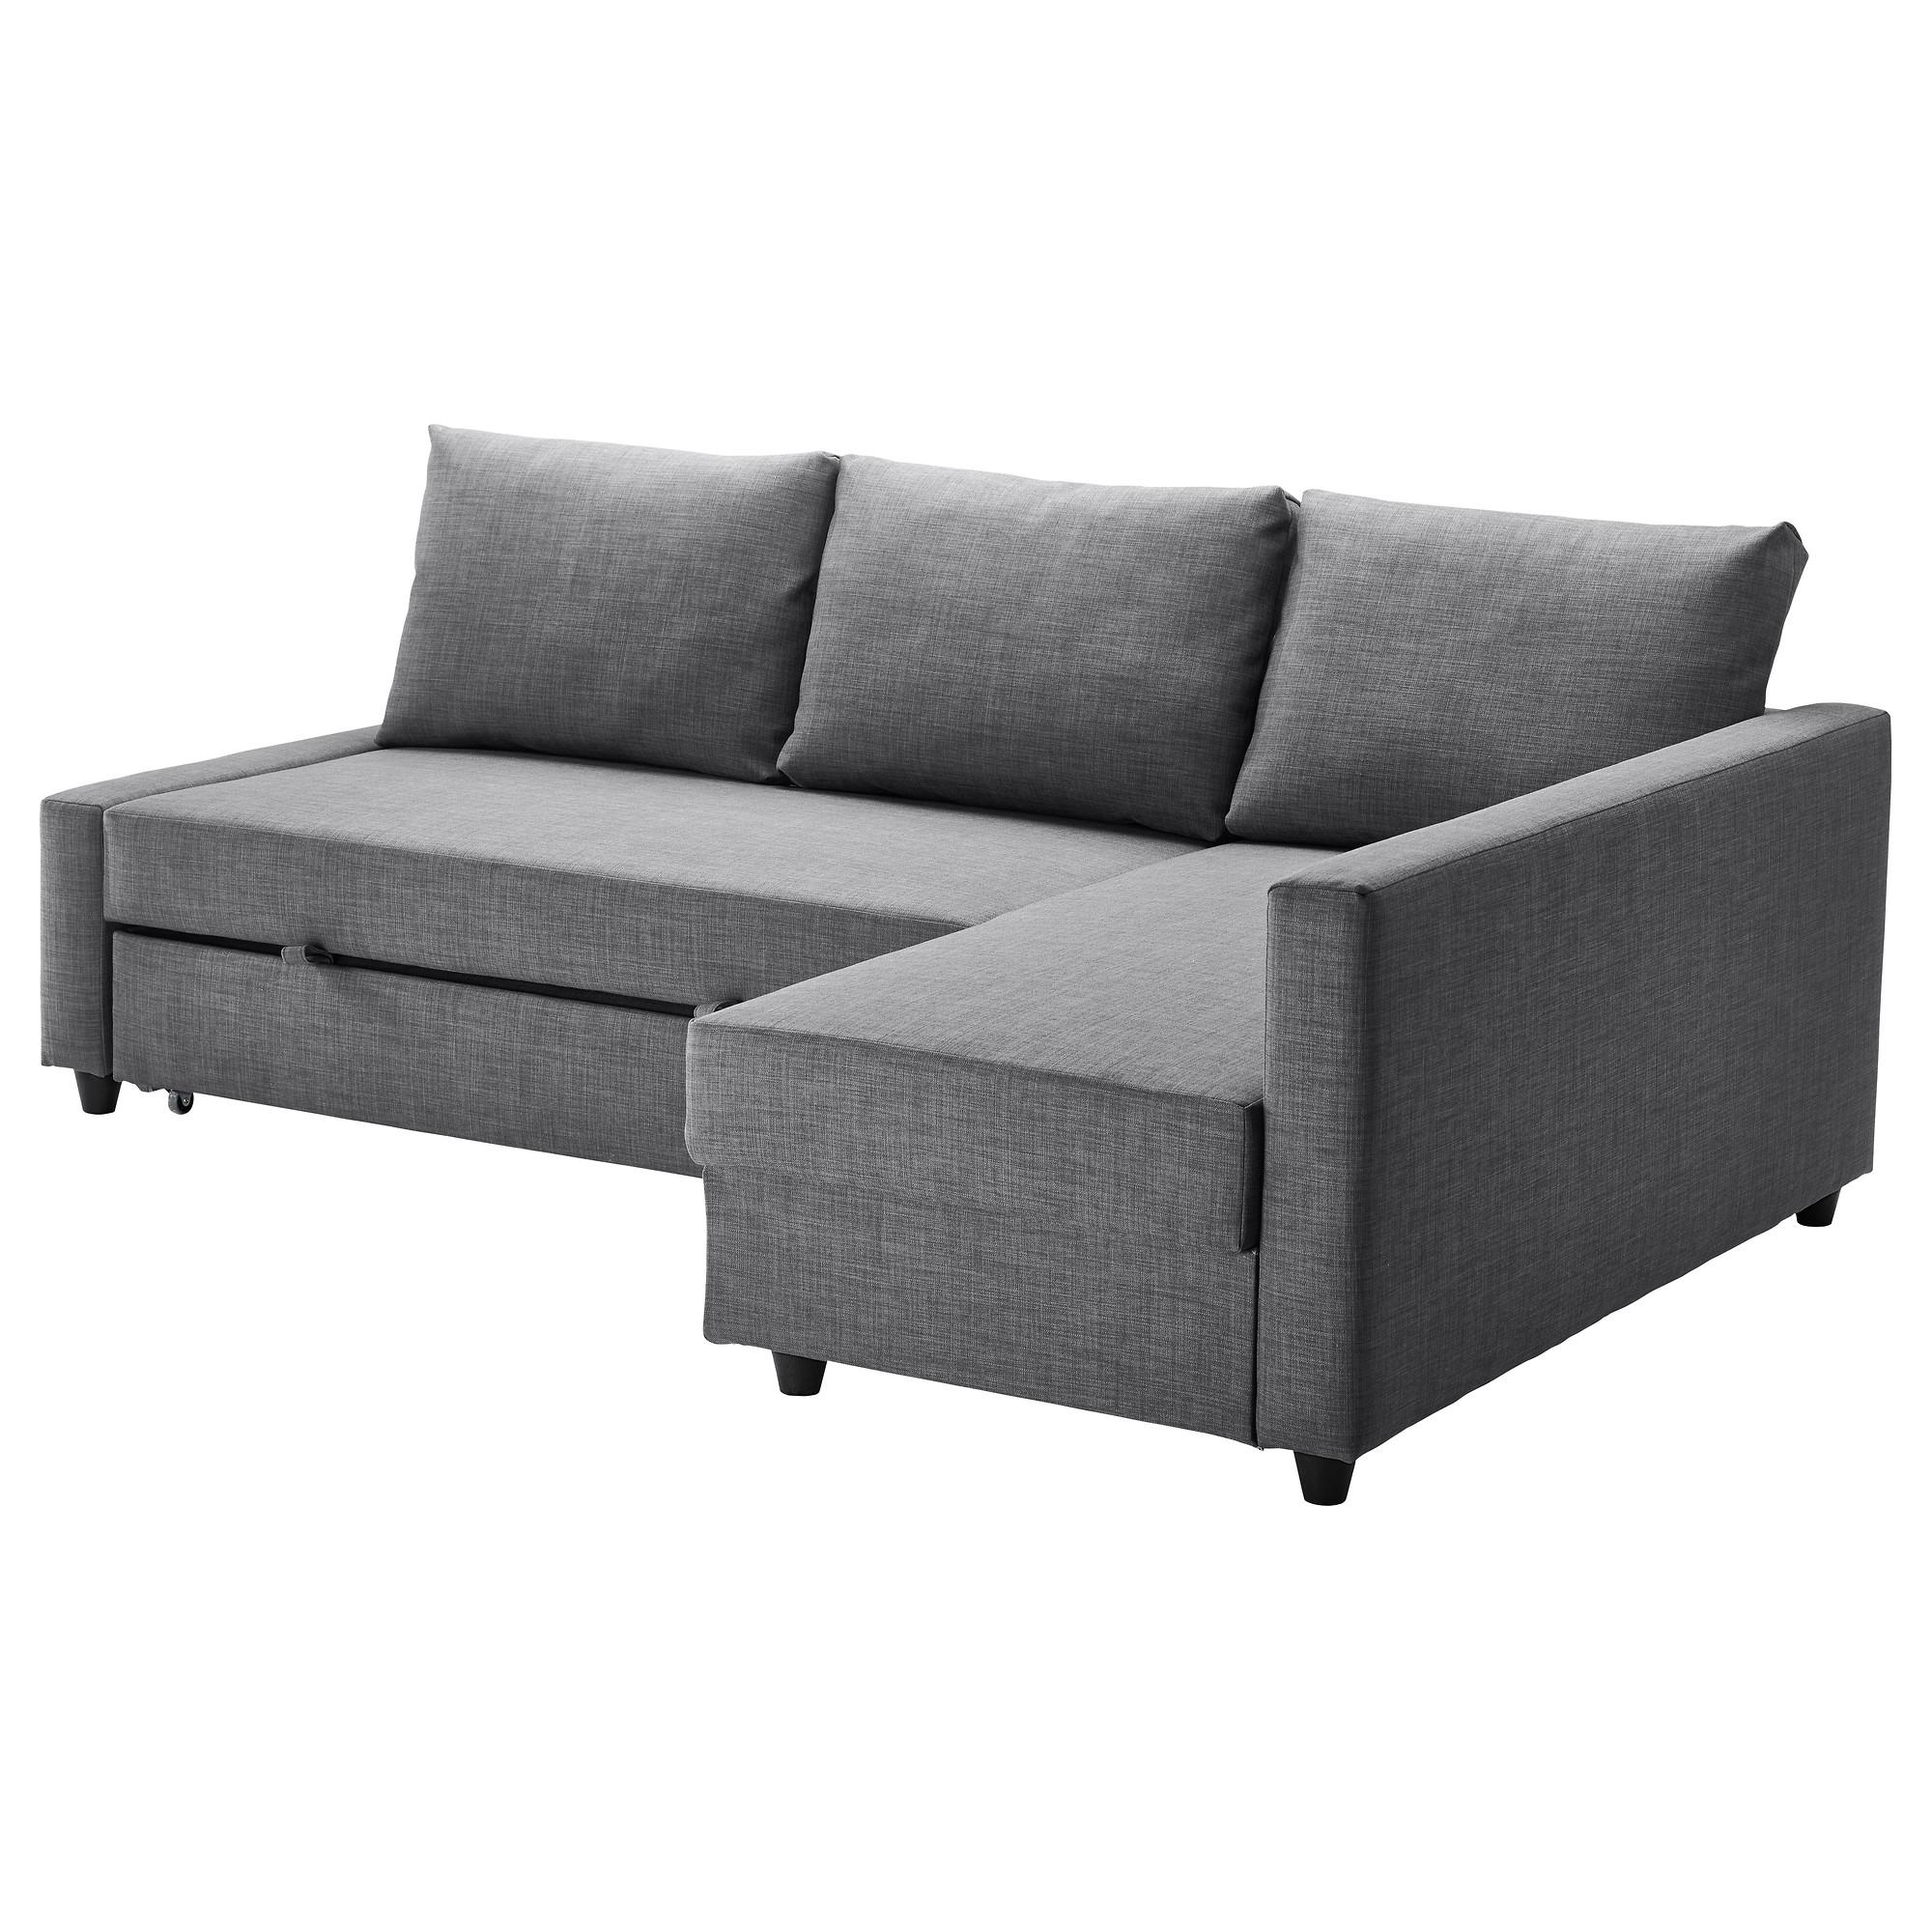 Friheten Corner Sofa Bed With Storage Skiftebo Dark Grey – Ikea With Regard To Ikea Corner Sofa Bed With Storage (View 2 of 20)